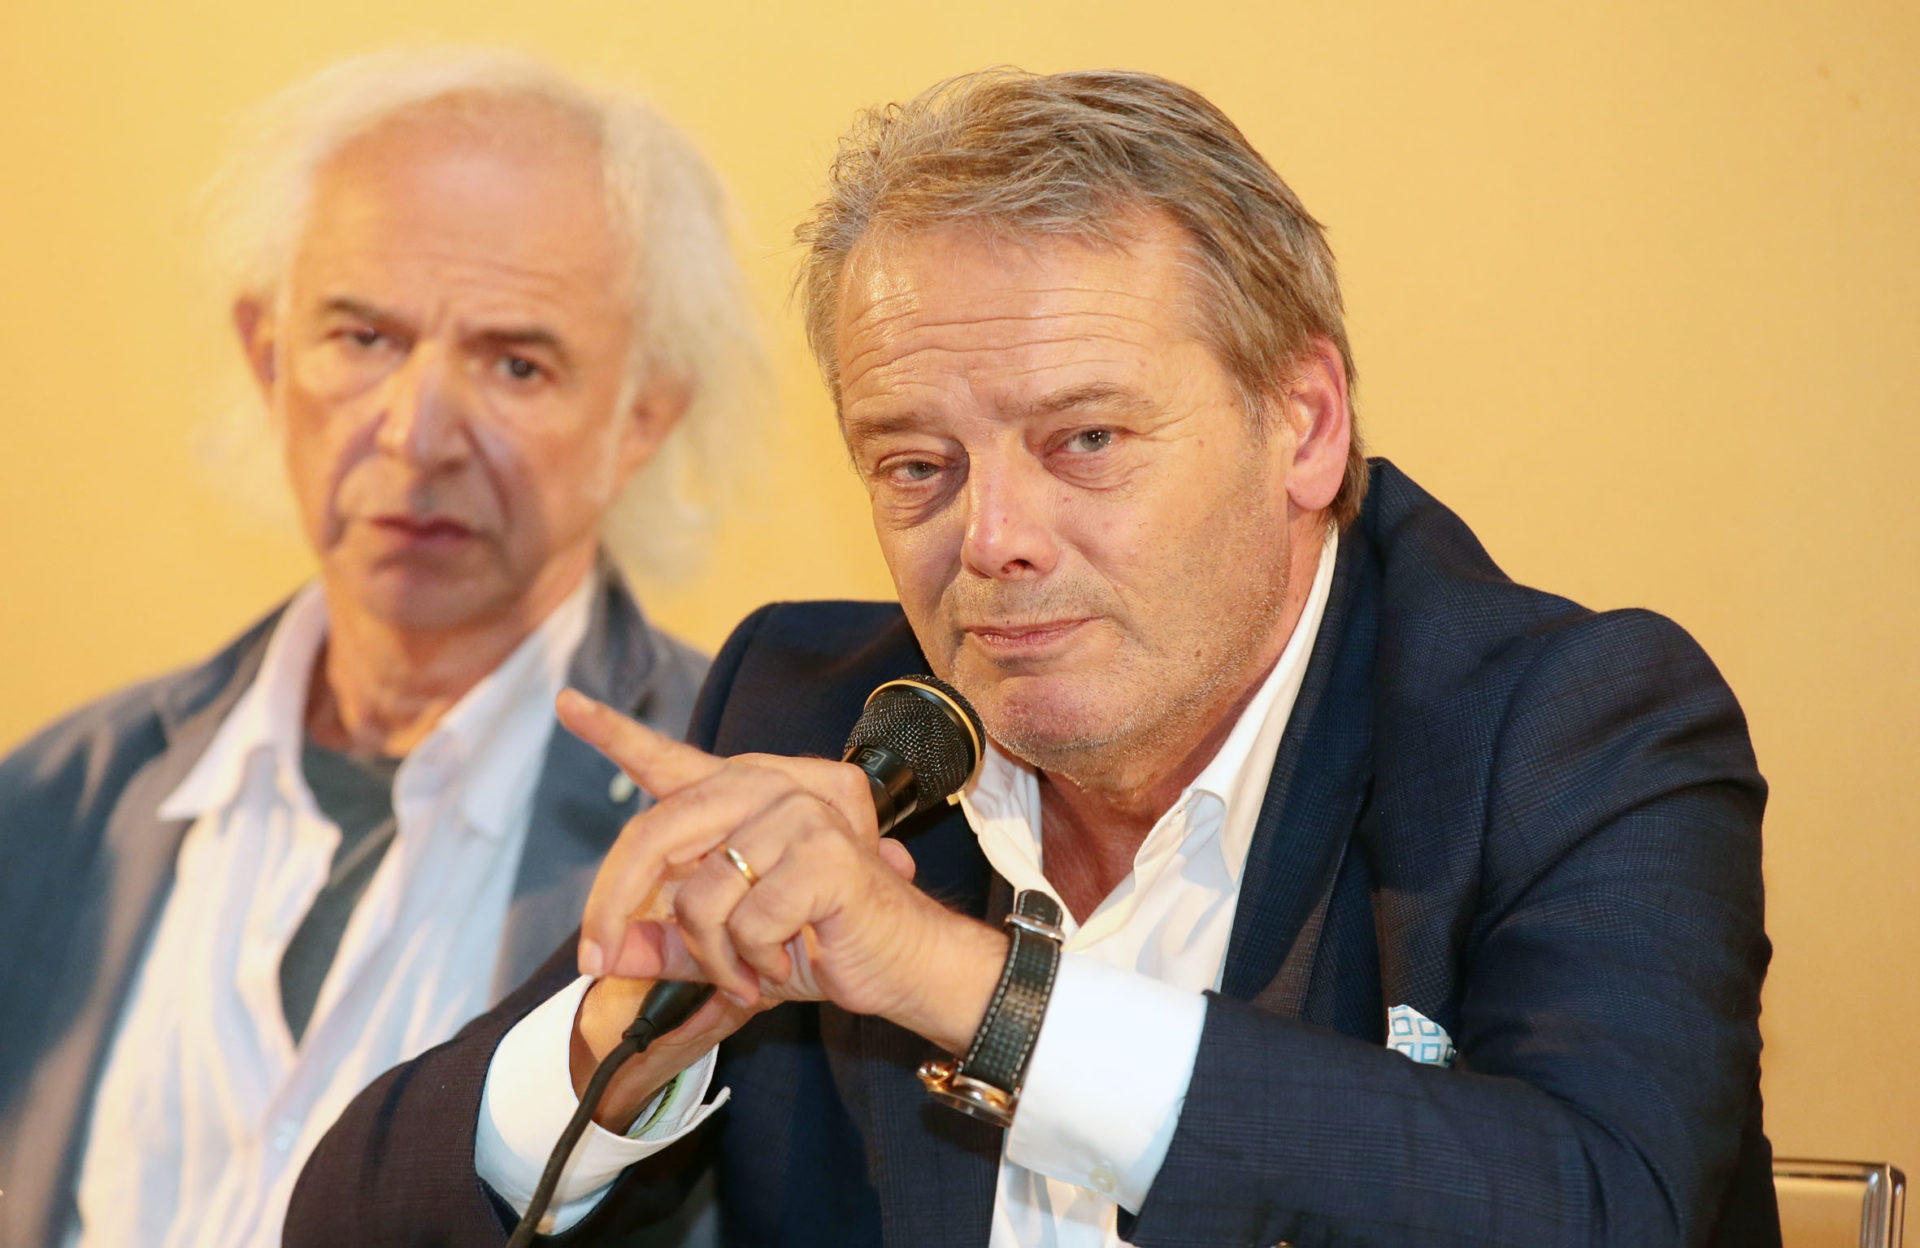 Leo Turrini e Roberto Alperoli - photo © Serena Campanini